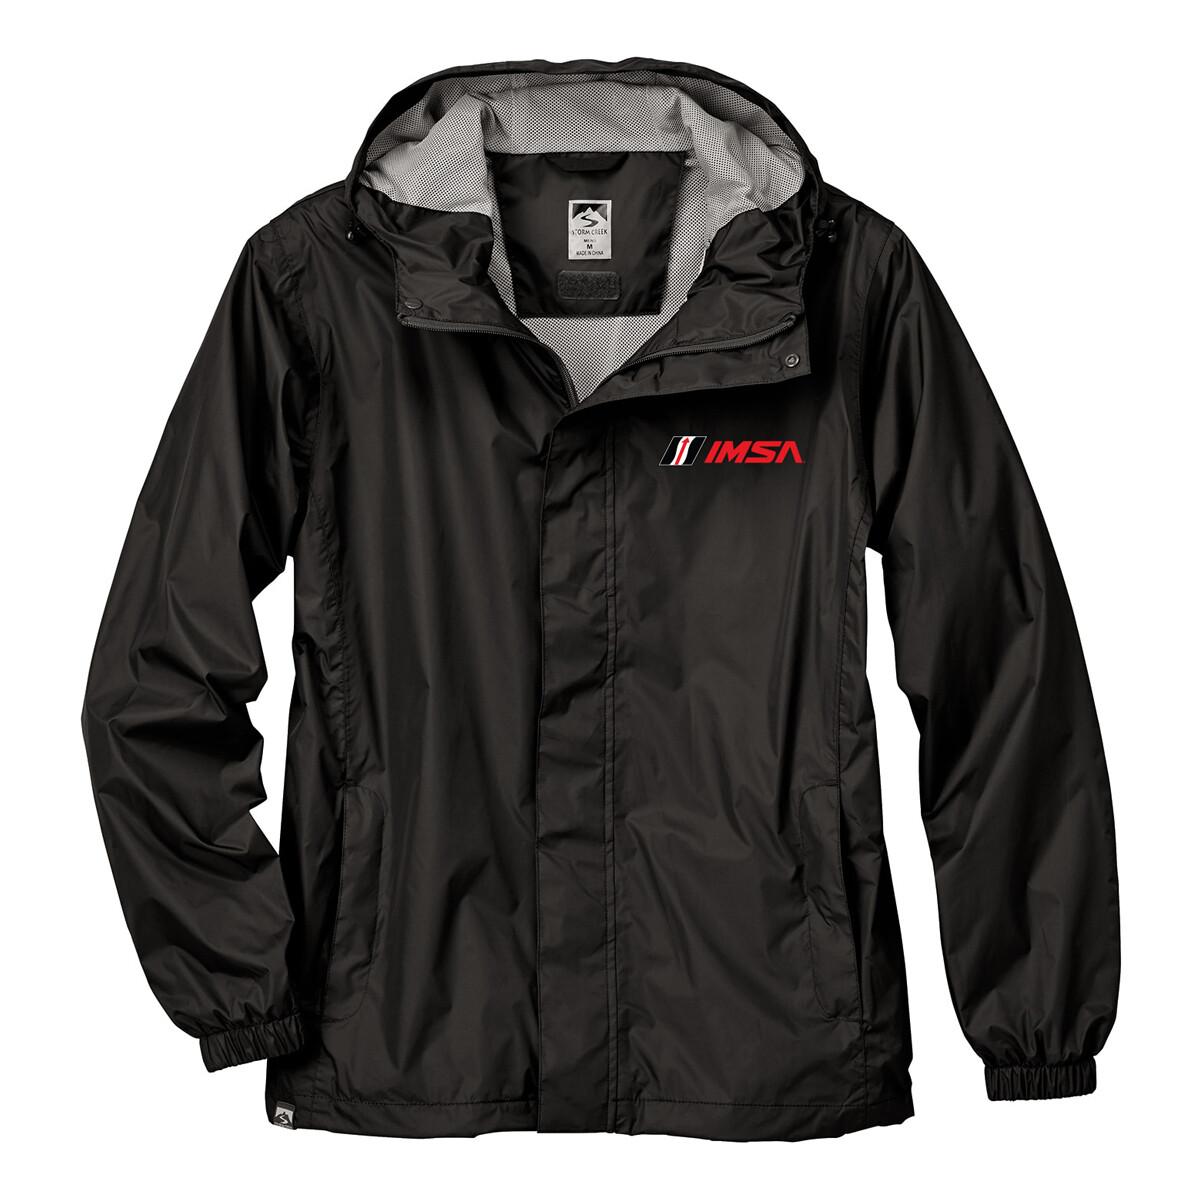 IMSA Waterproof Jacket Blk/Gry